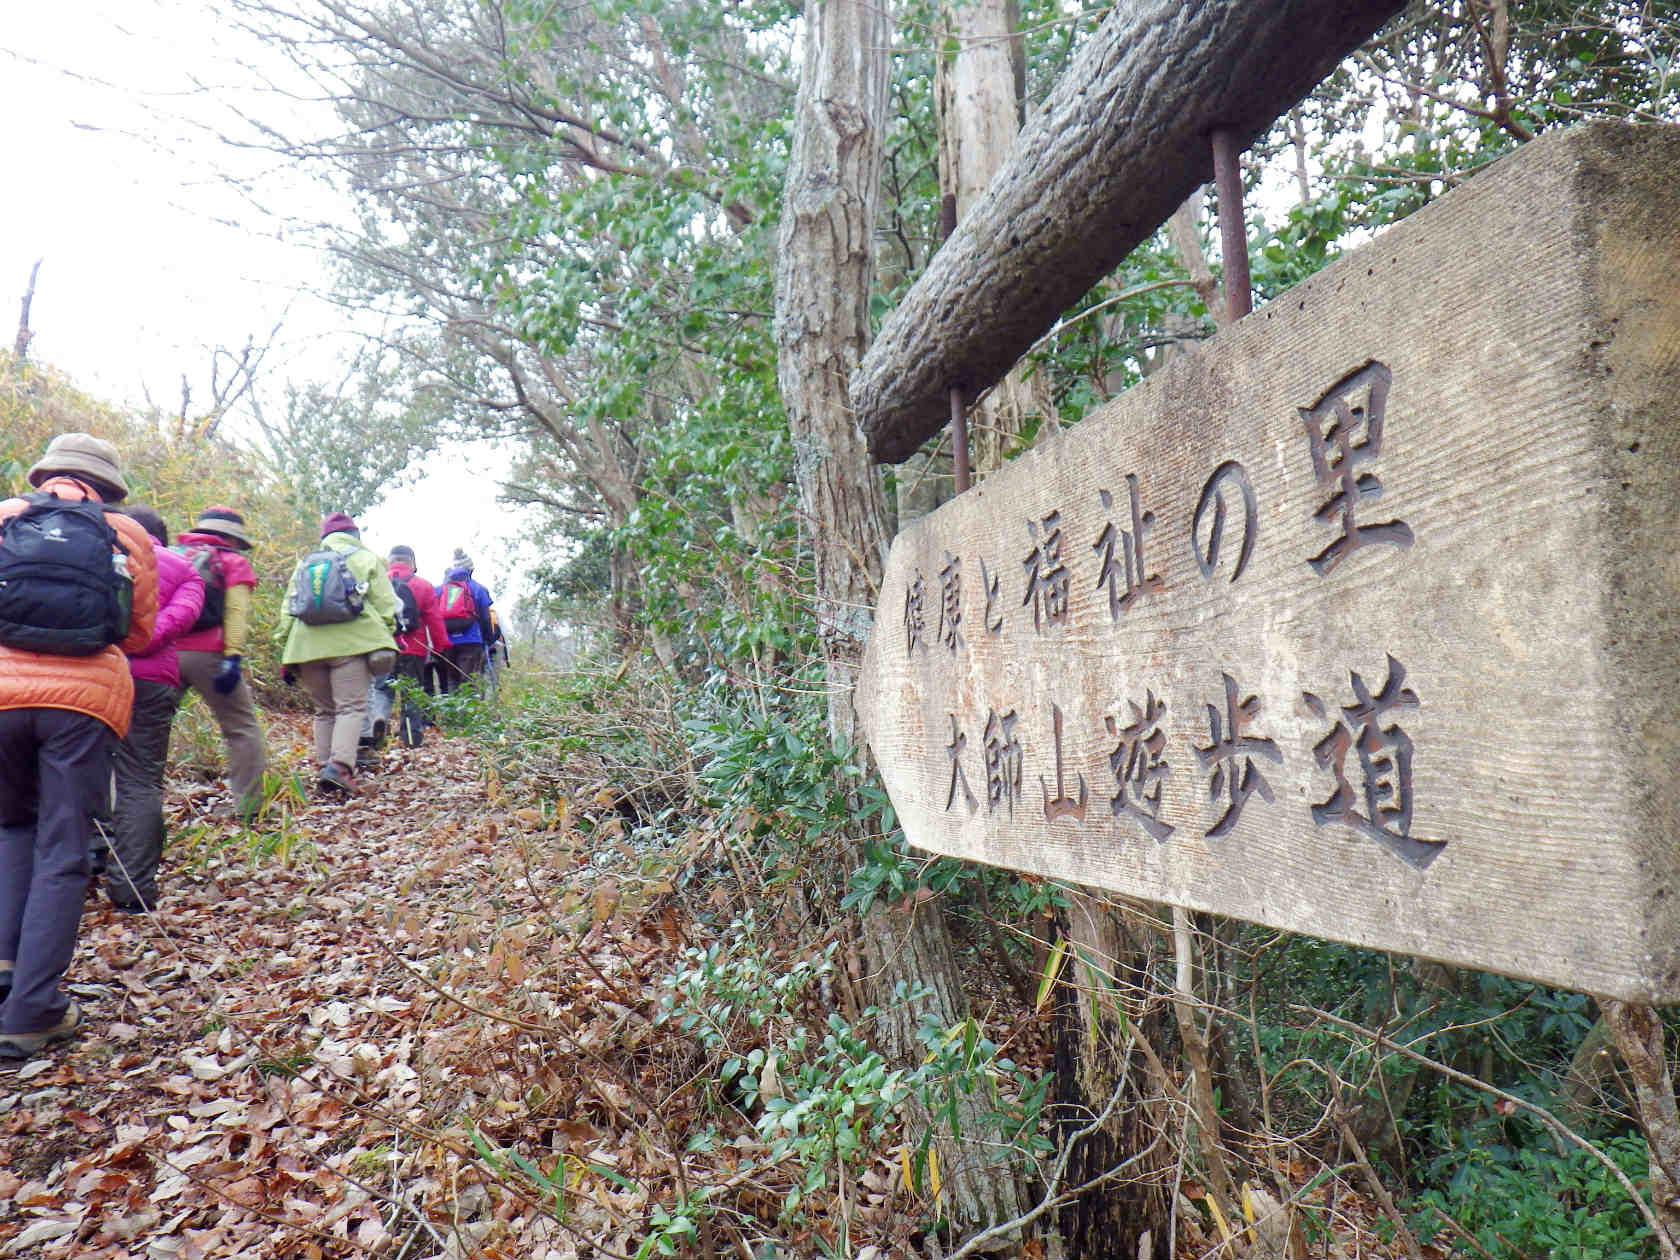 08a 大師山遊歩道を進む